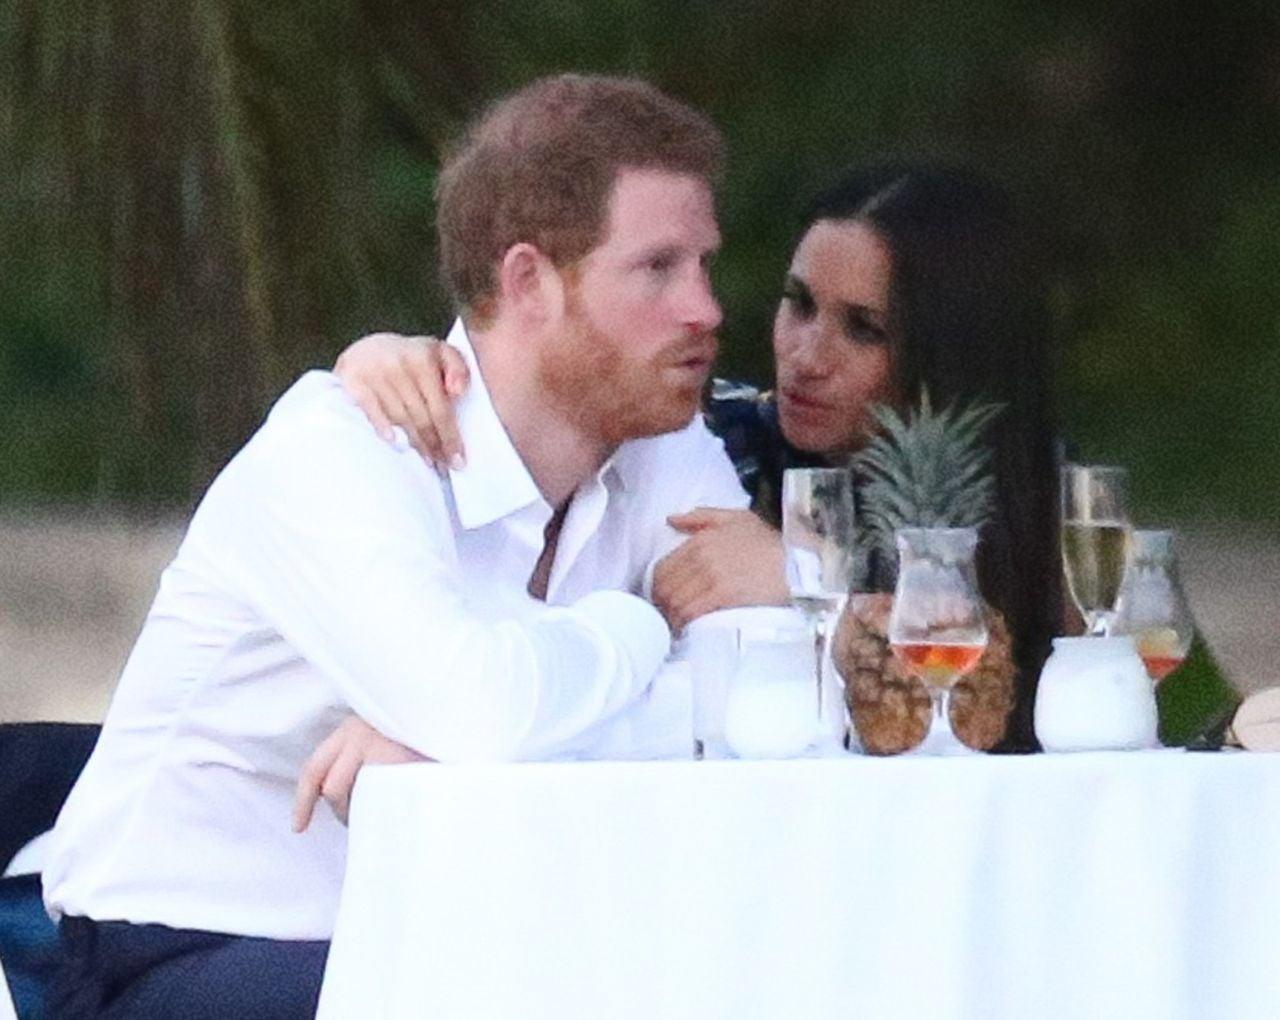 prince harry and meghan markle adorable pda at